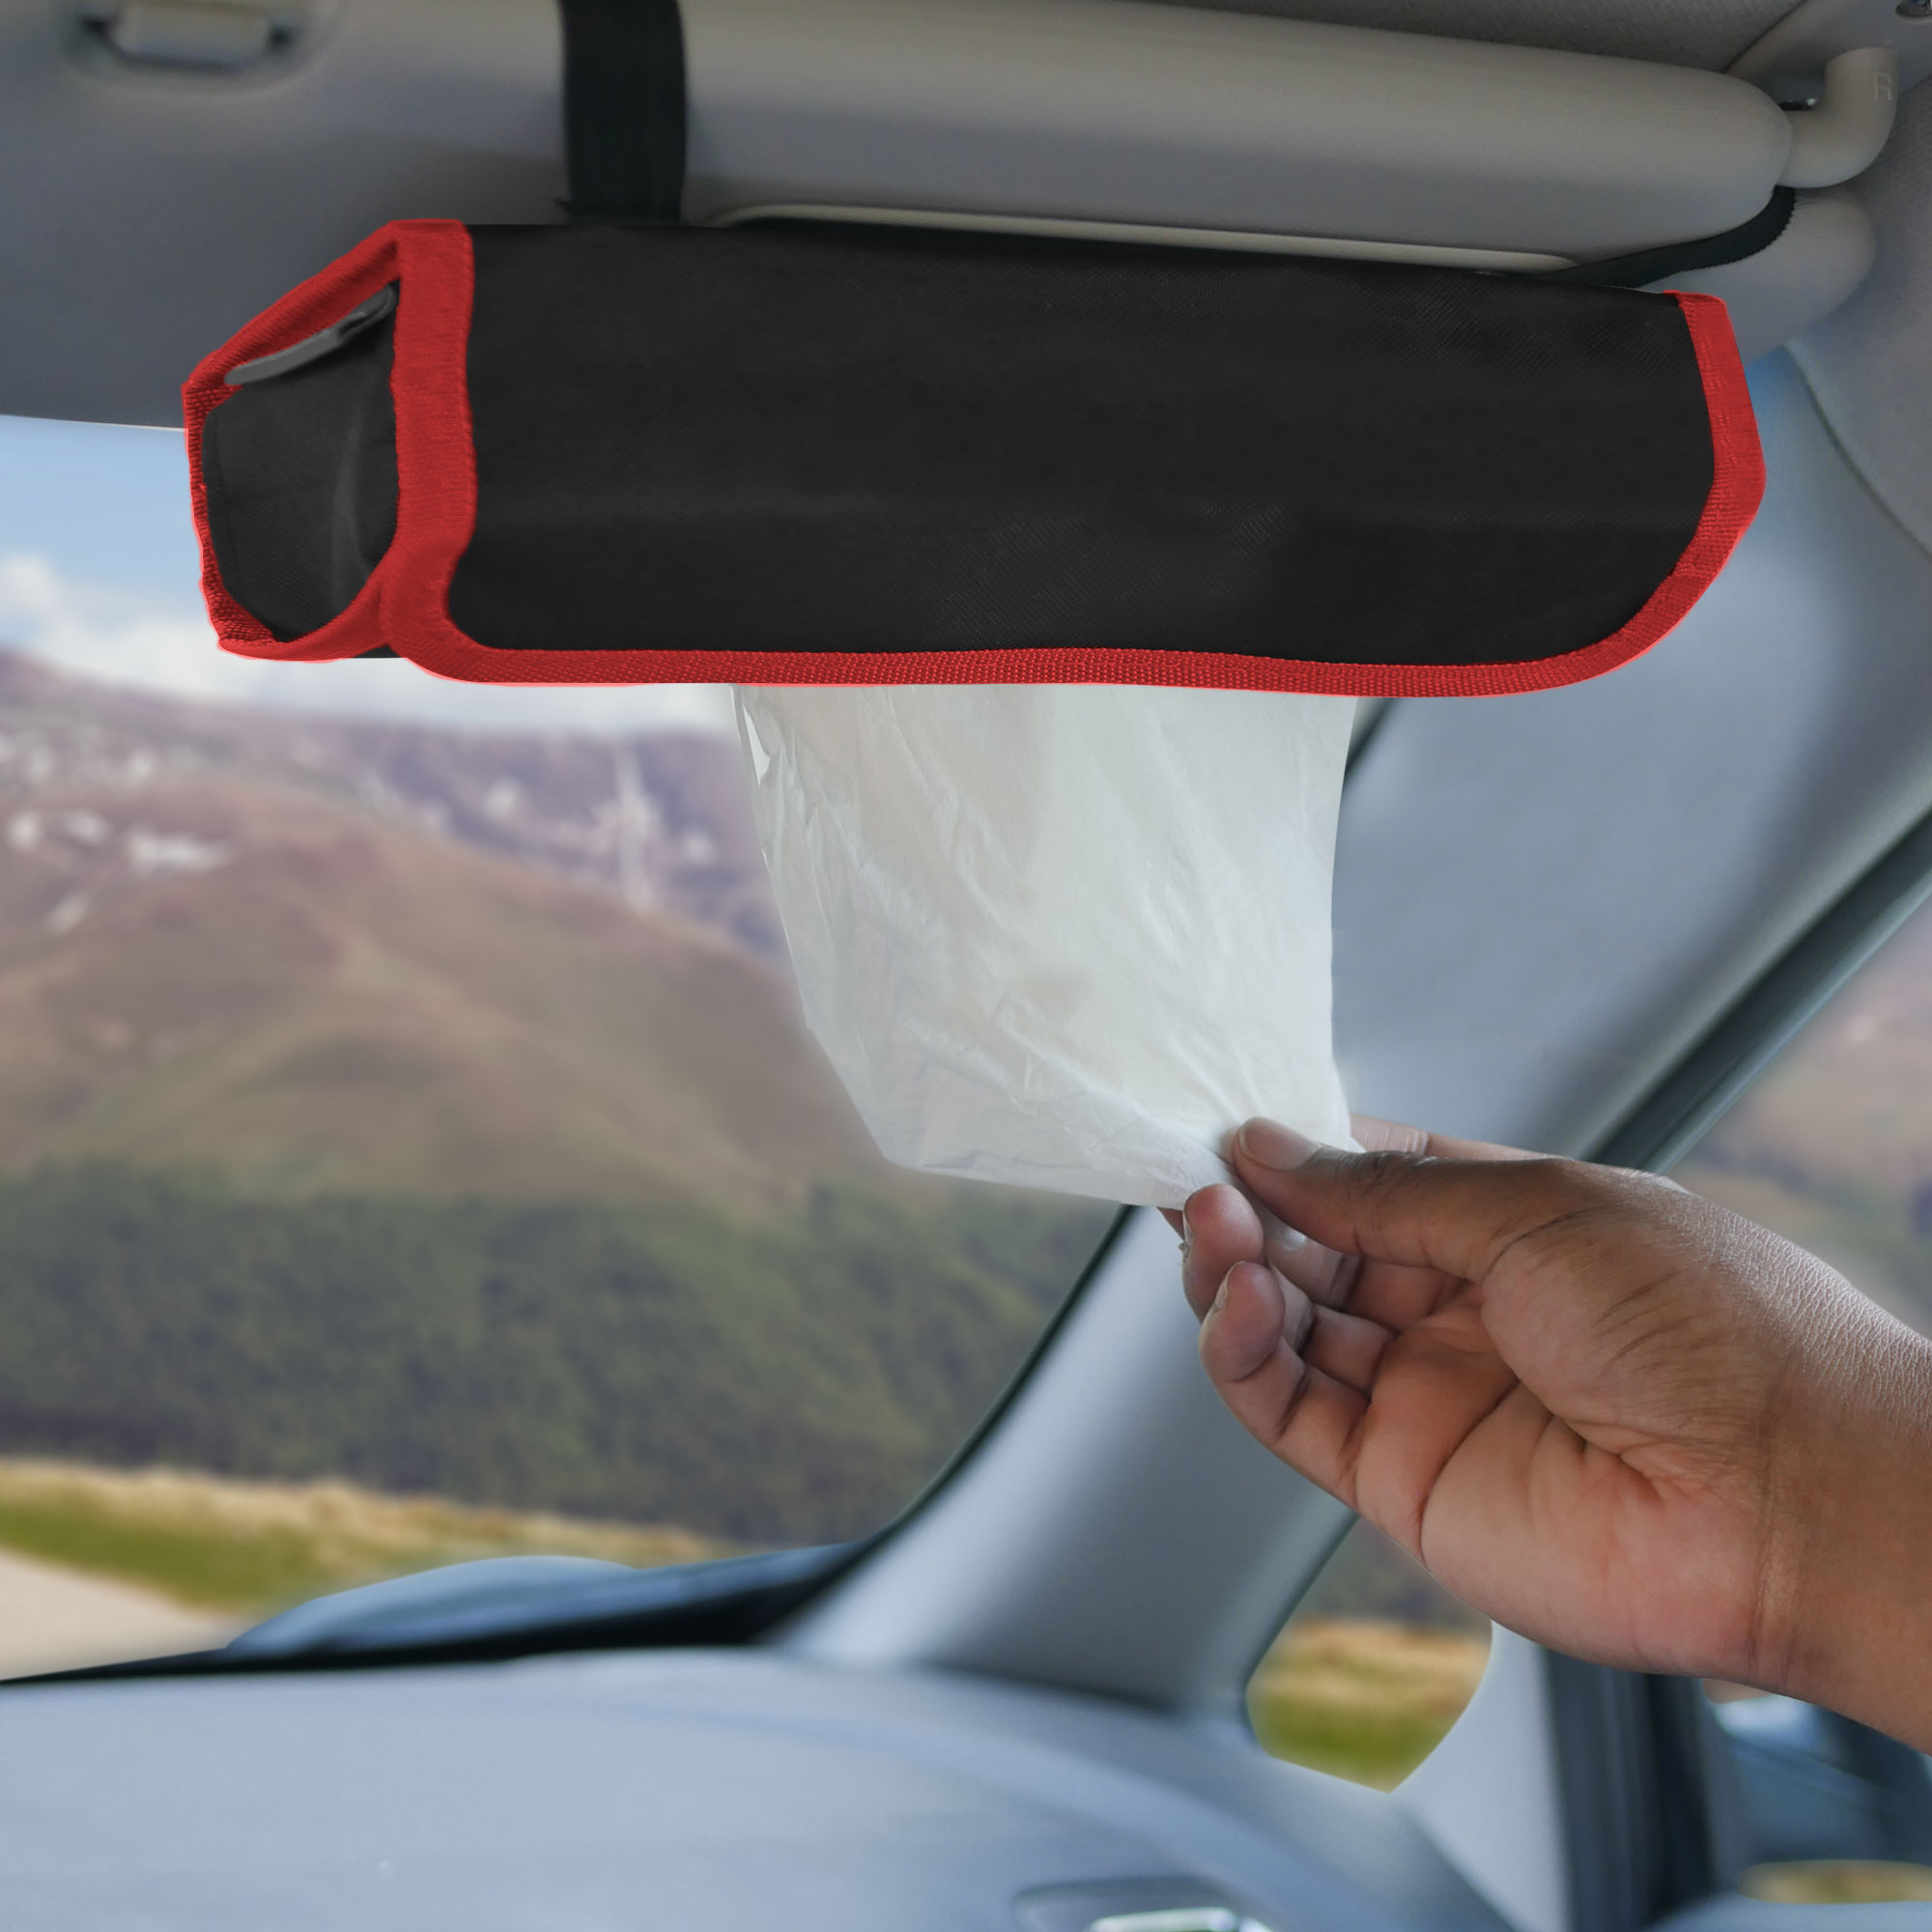 fh1136 red black car organizer tissue dispenser